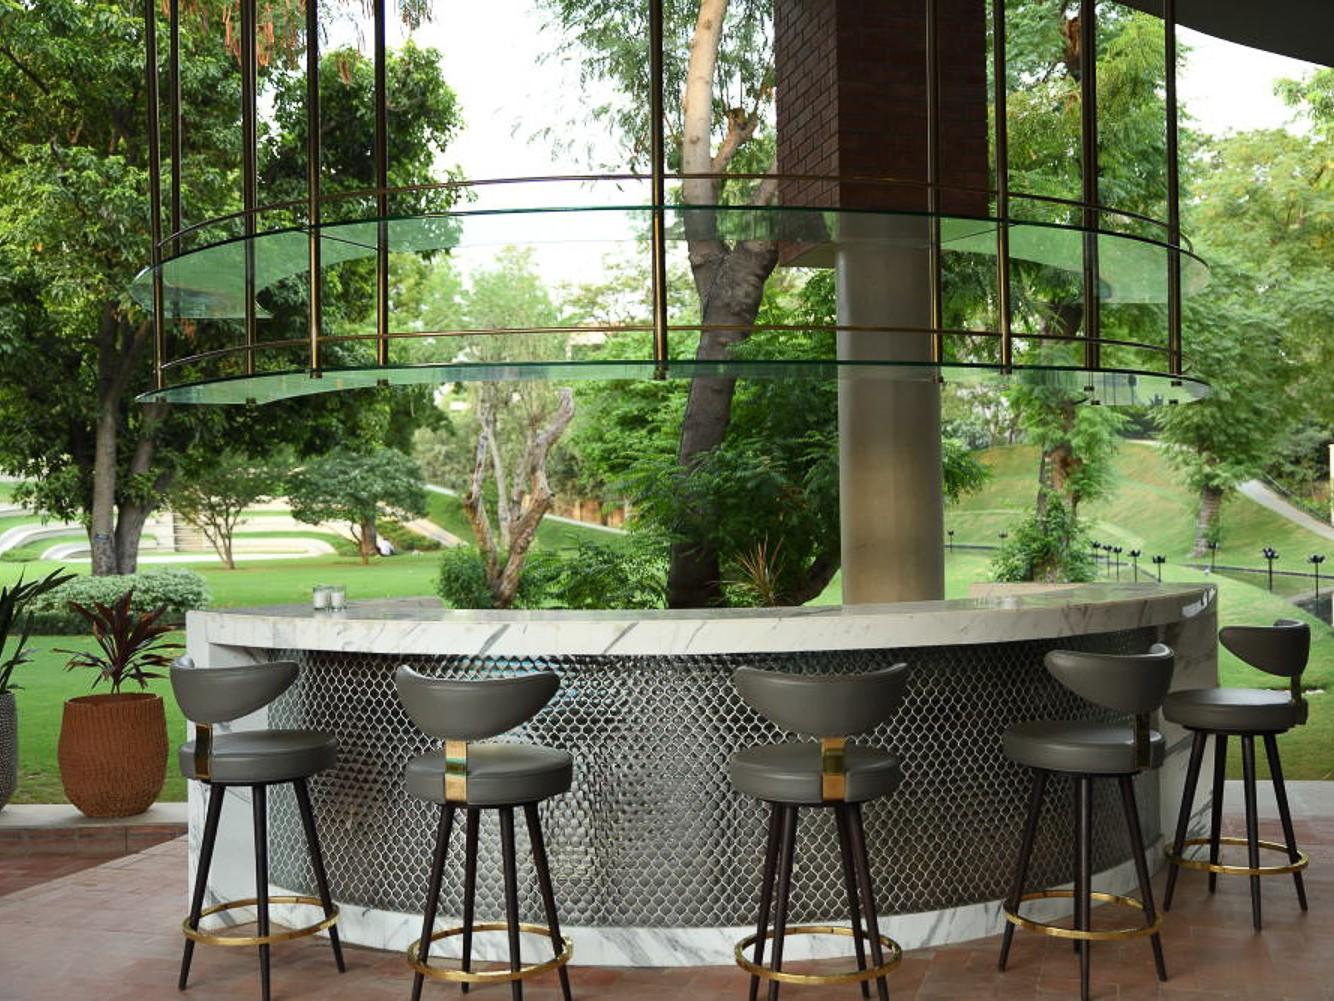 delhi family retreat farm house design bar area